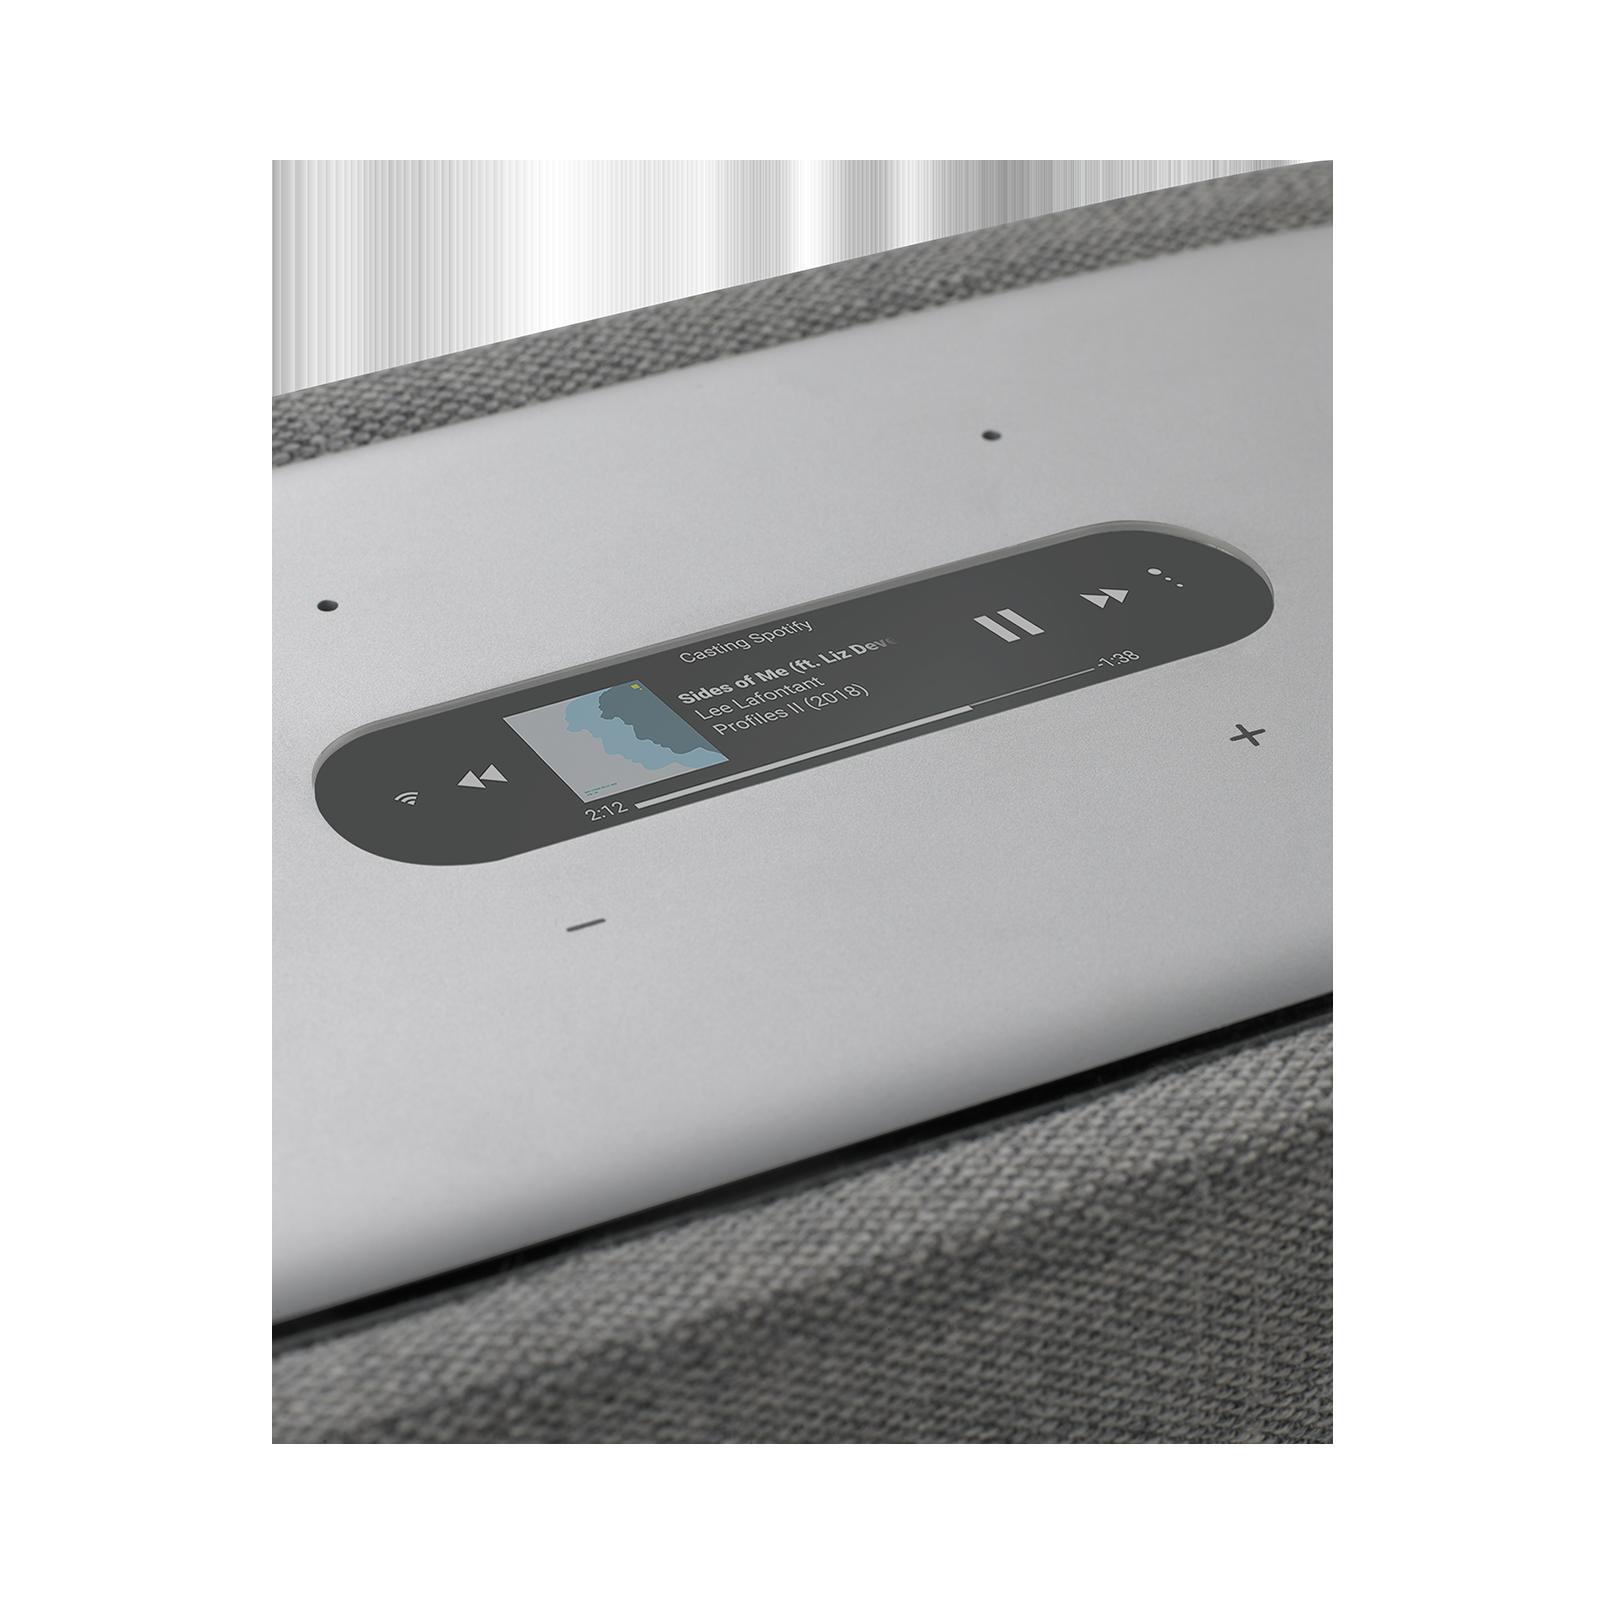 Harman Kardon Citation 300 - Grey - The medium-size smart home speaker with award winning design - Detailshot 1